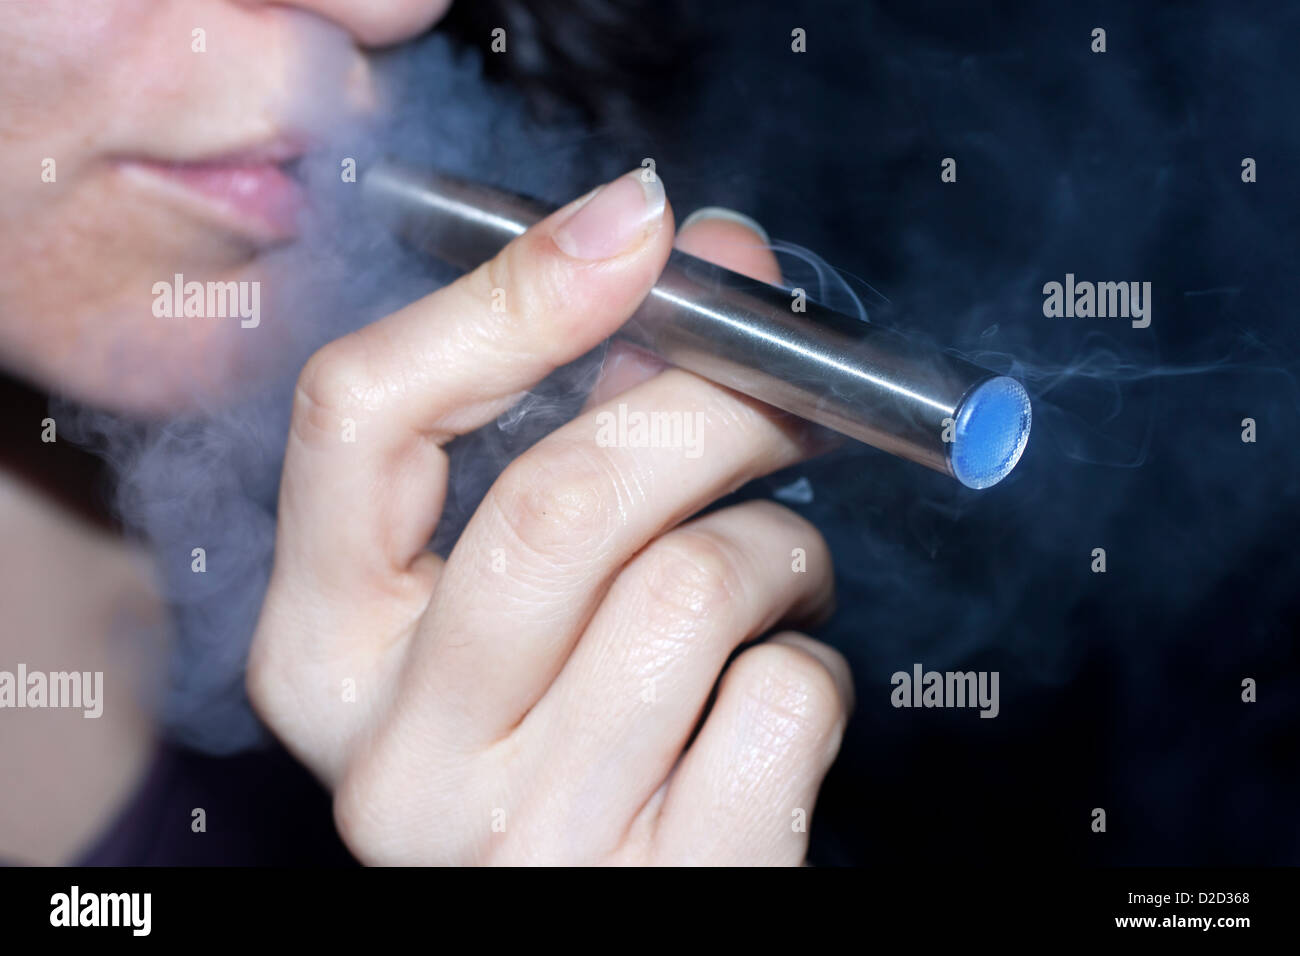 Woman smoking electronic cigarette closeup - Stock Image